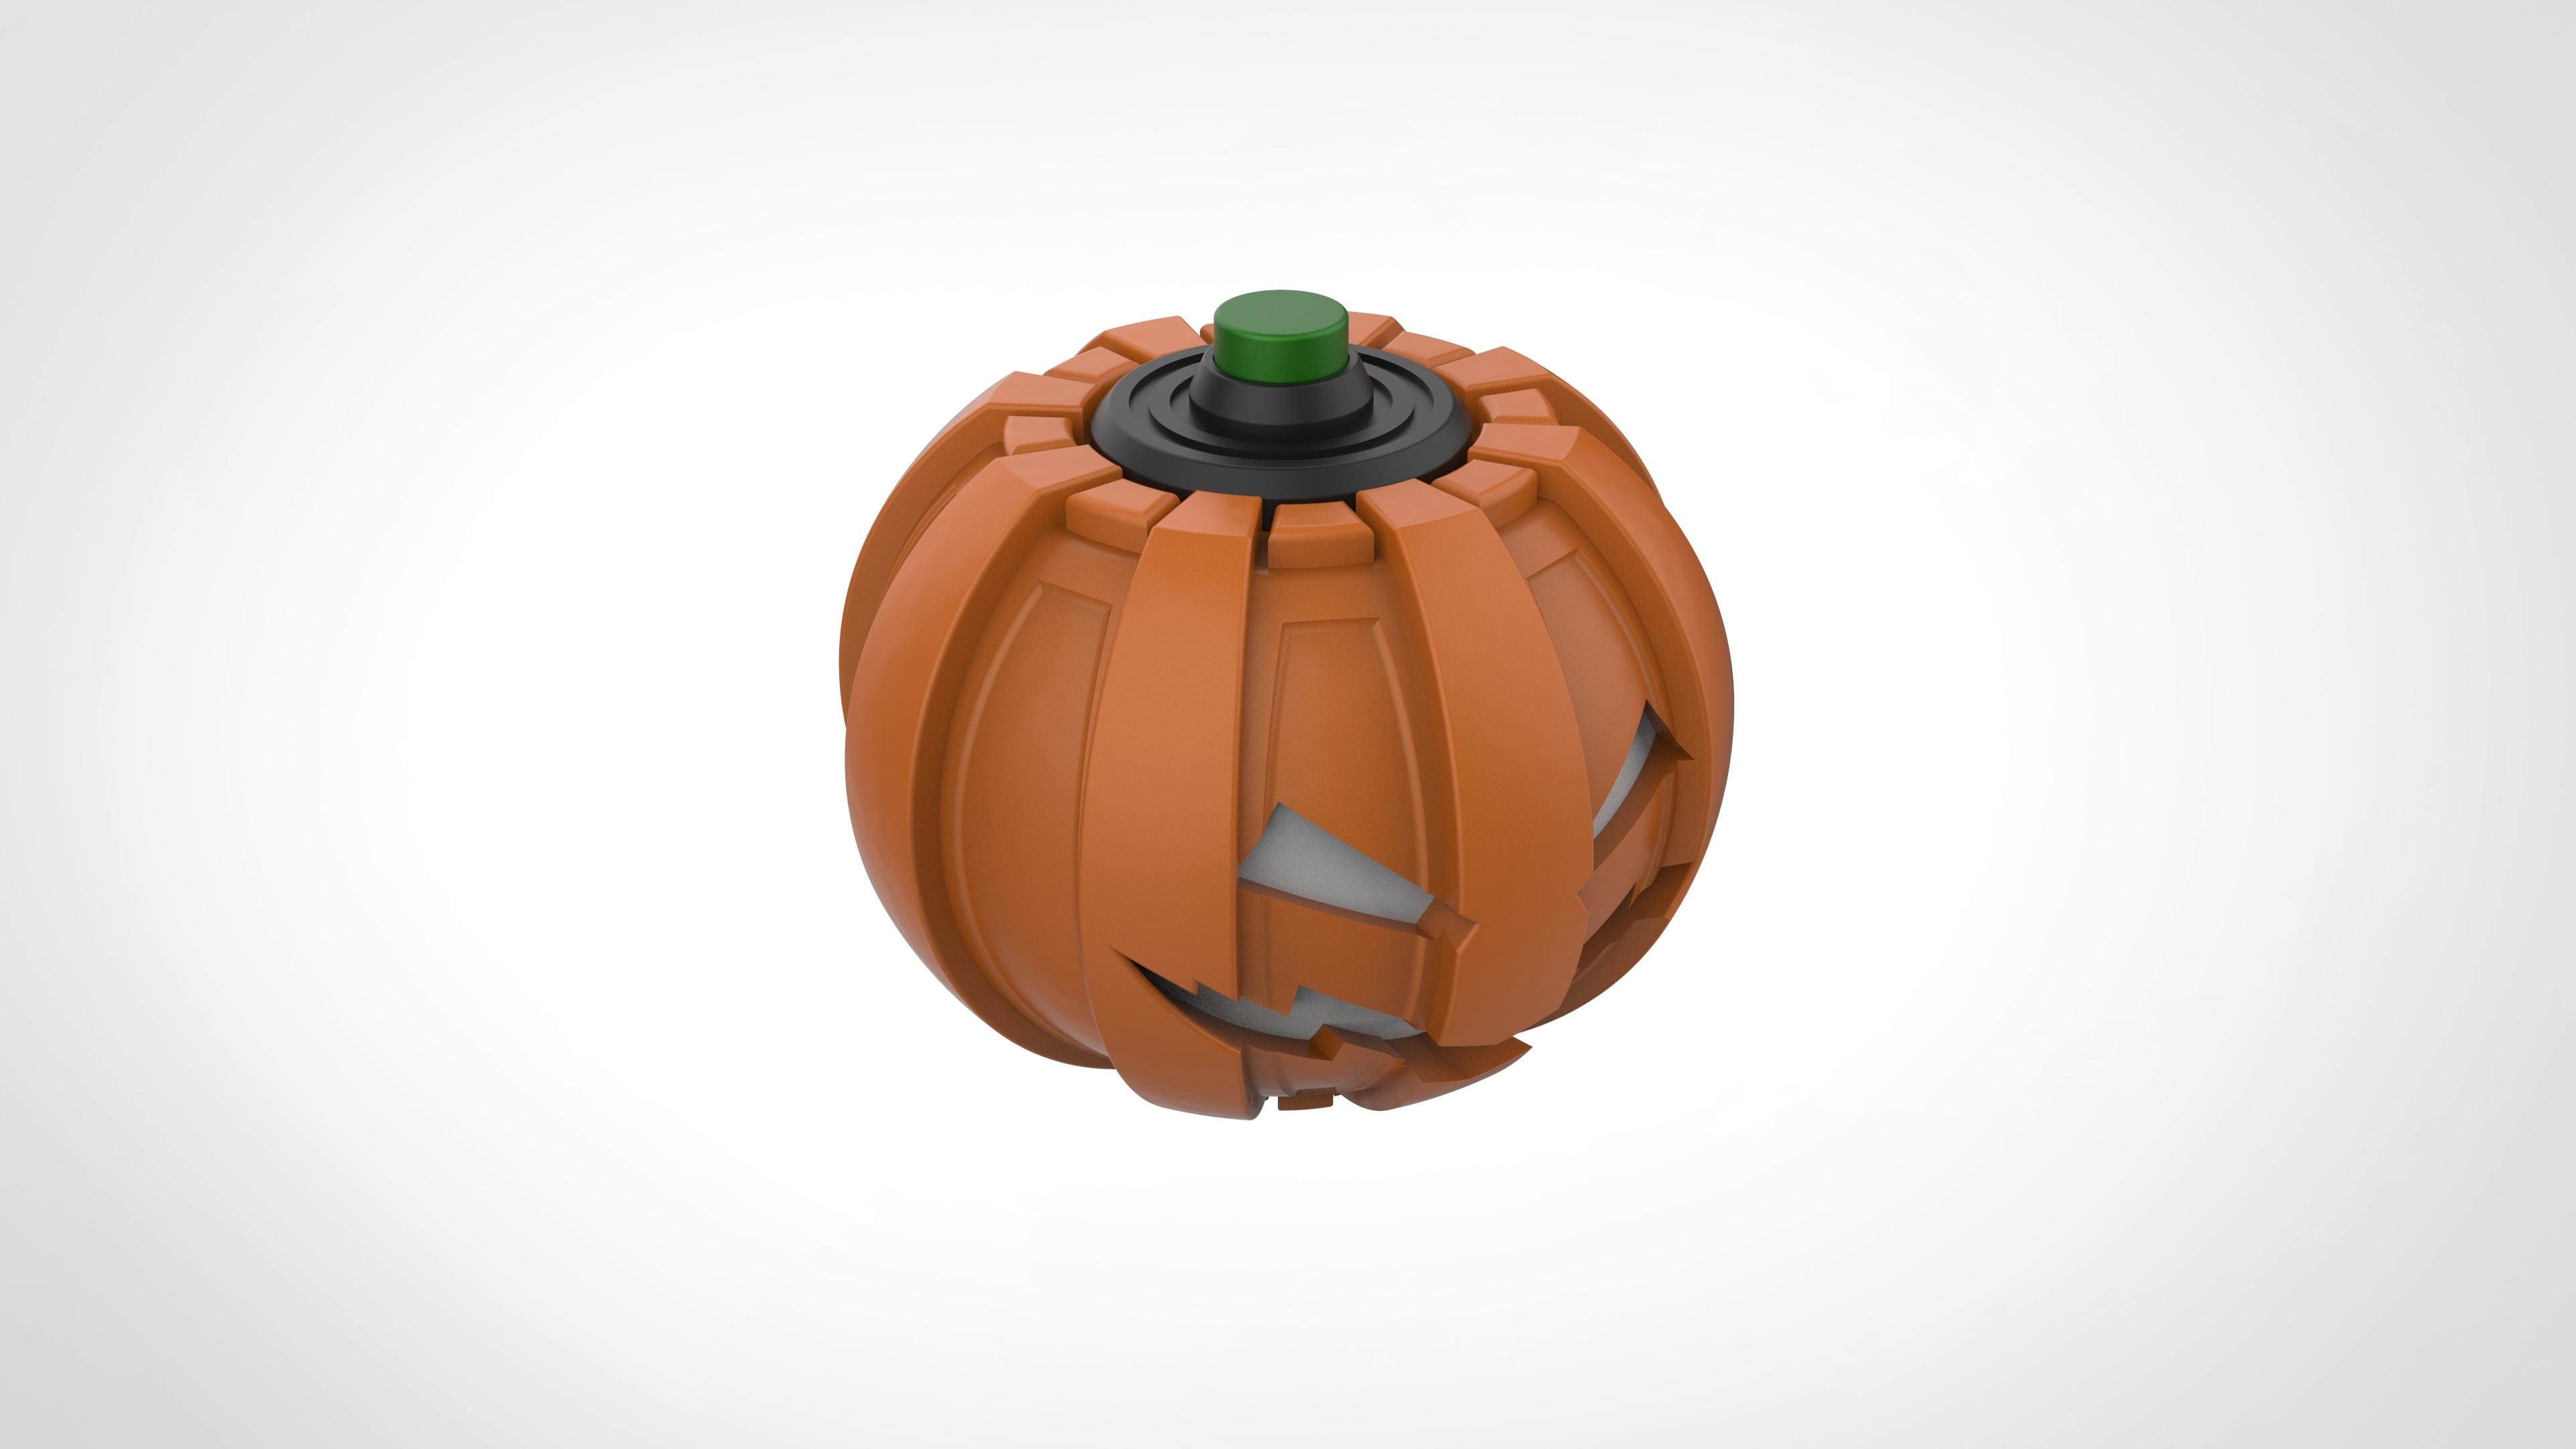 015.jpg Download 3MF file Green goblin bombs from the Spide-Man comics • 3D print model, vetrock